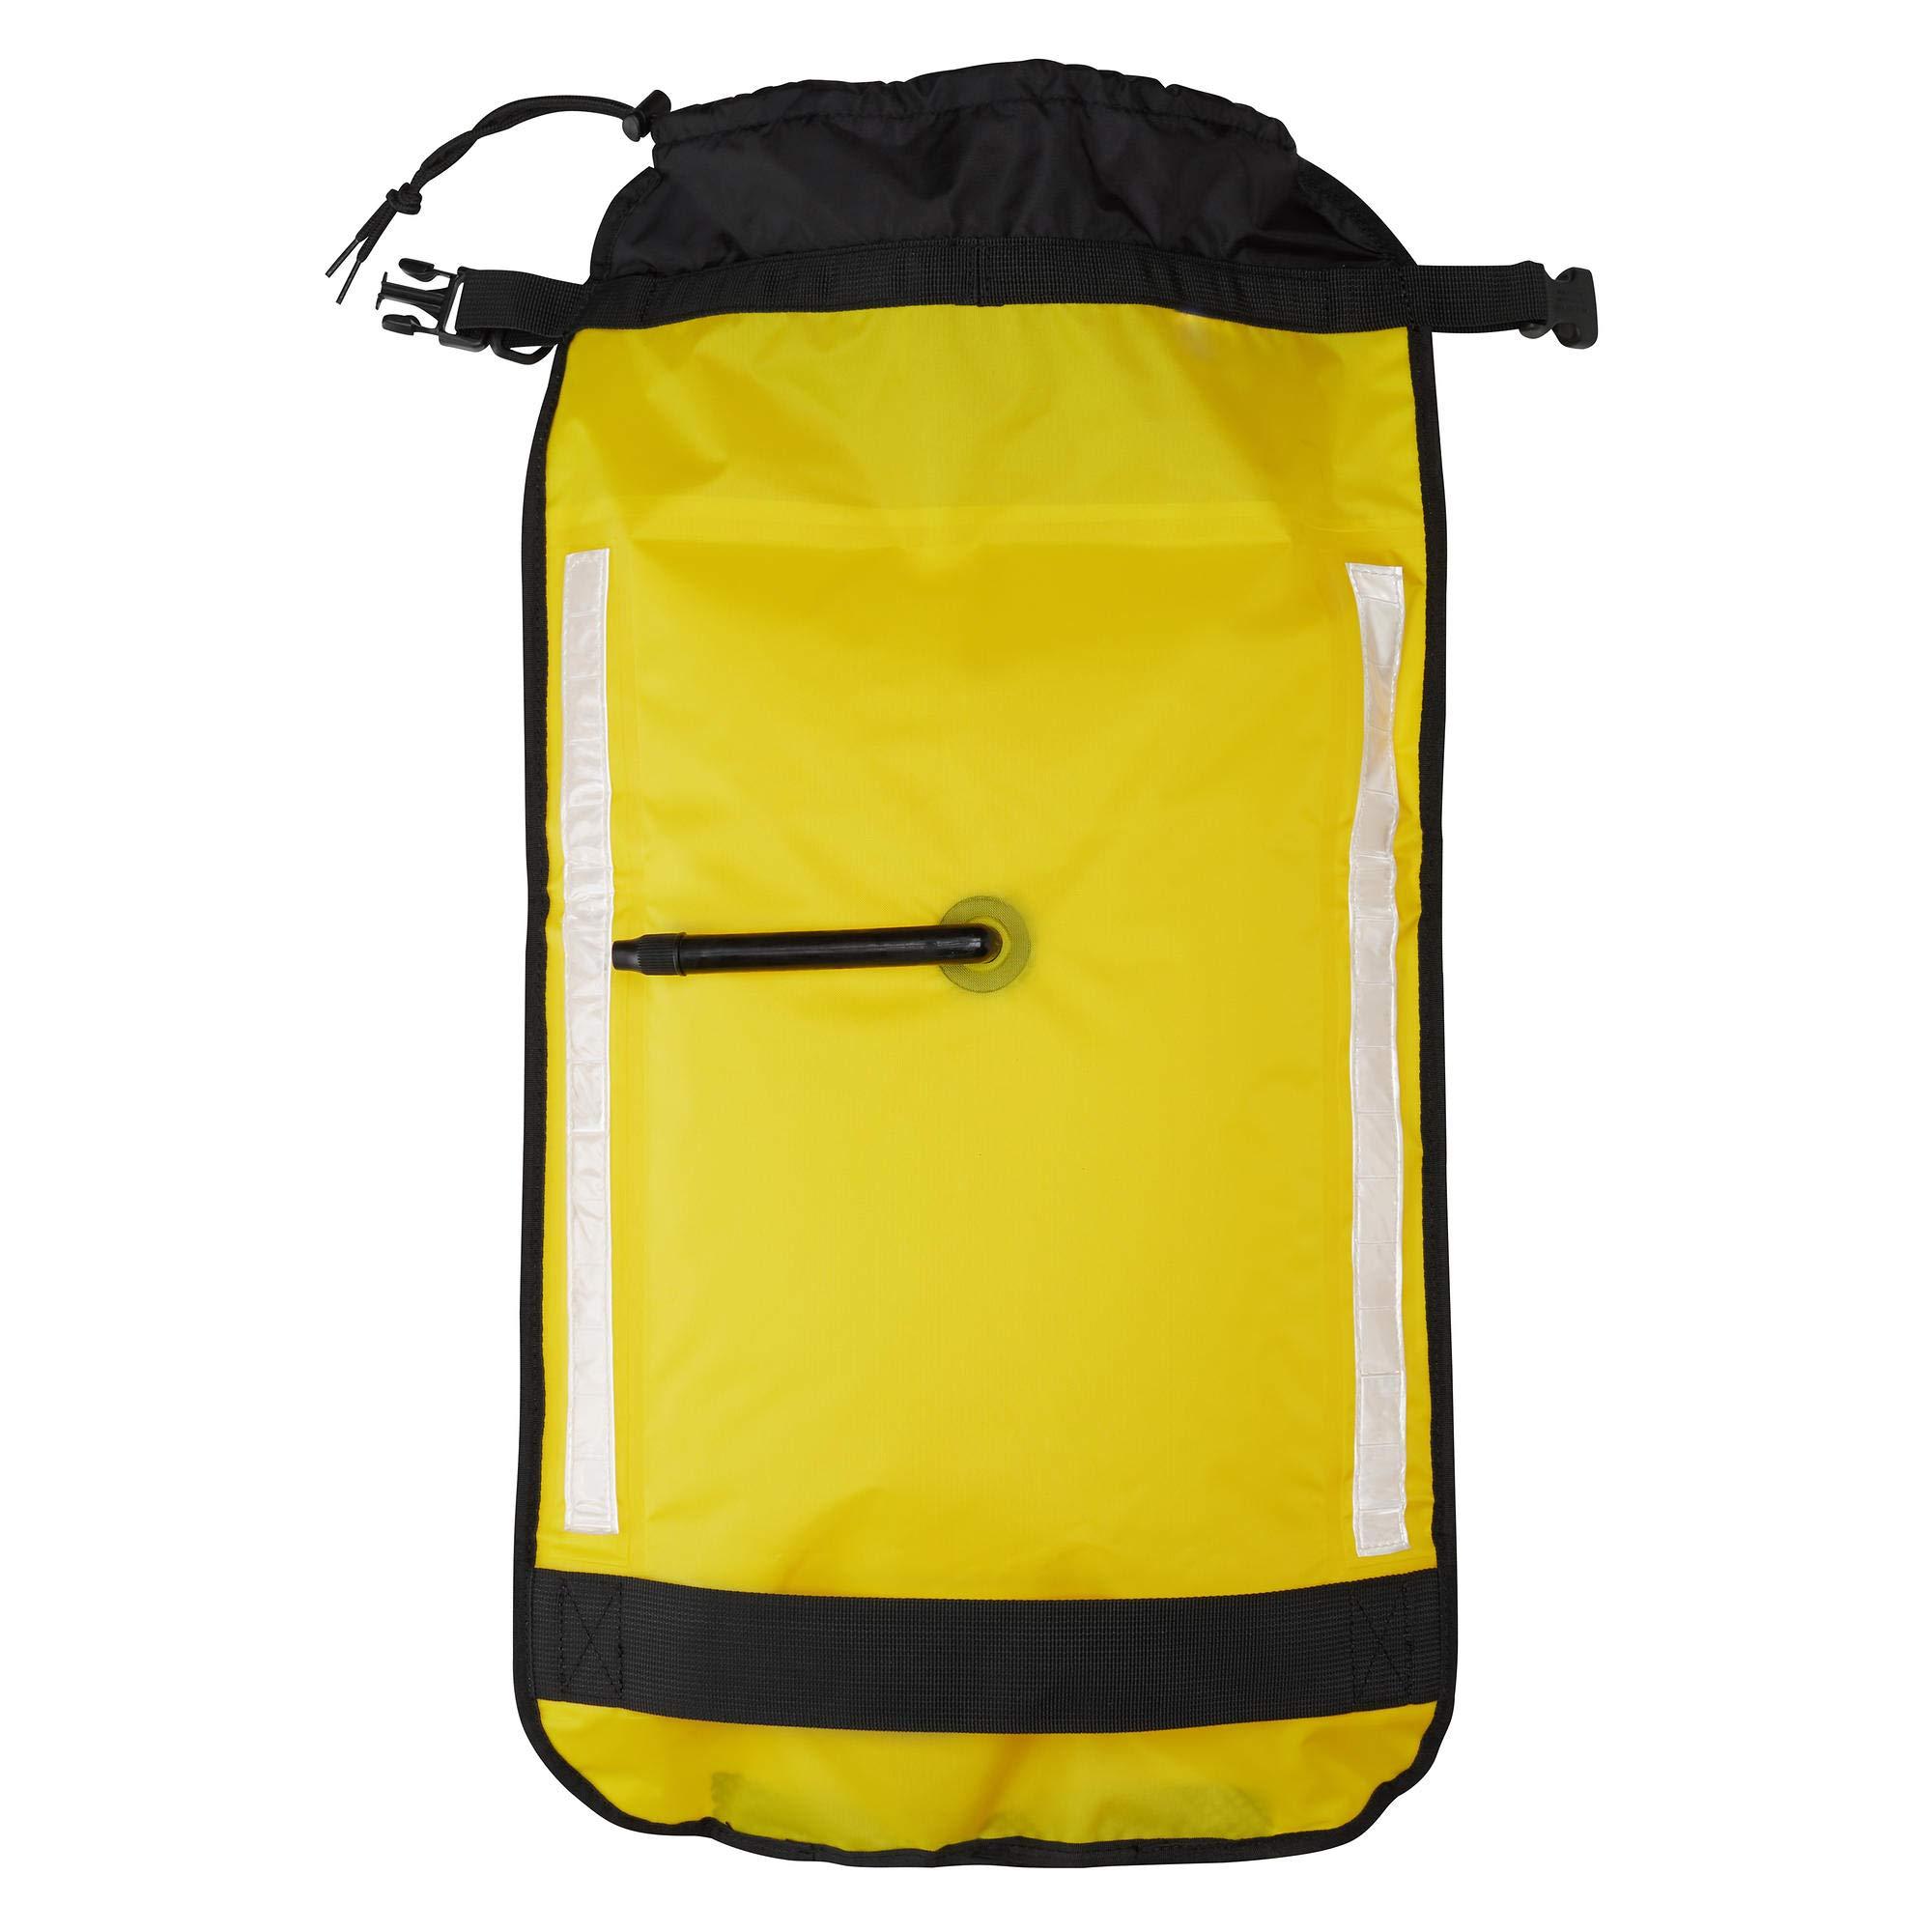 NRS Sea Kayak Paddle Float Yellow One Size